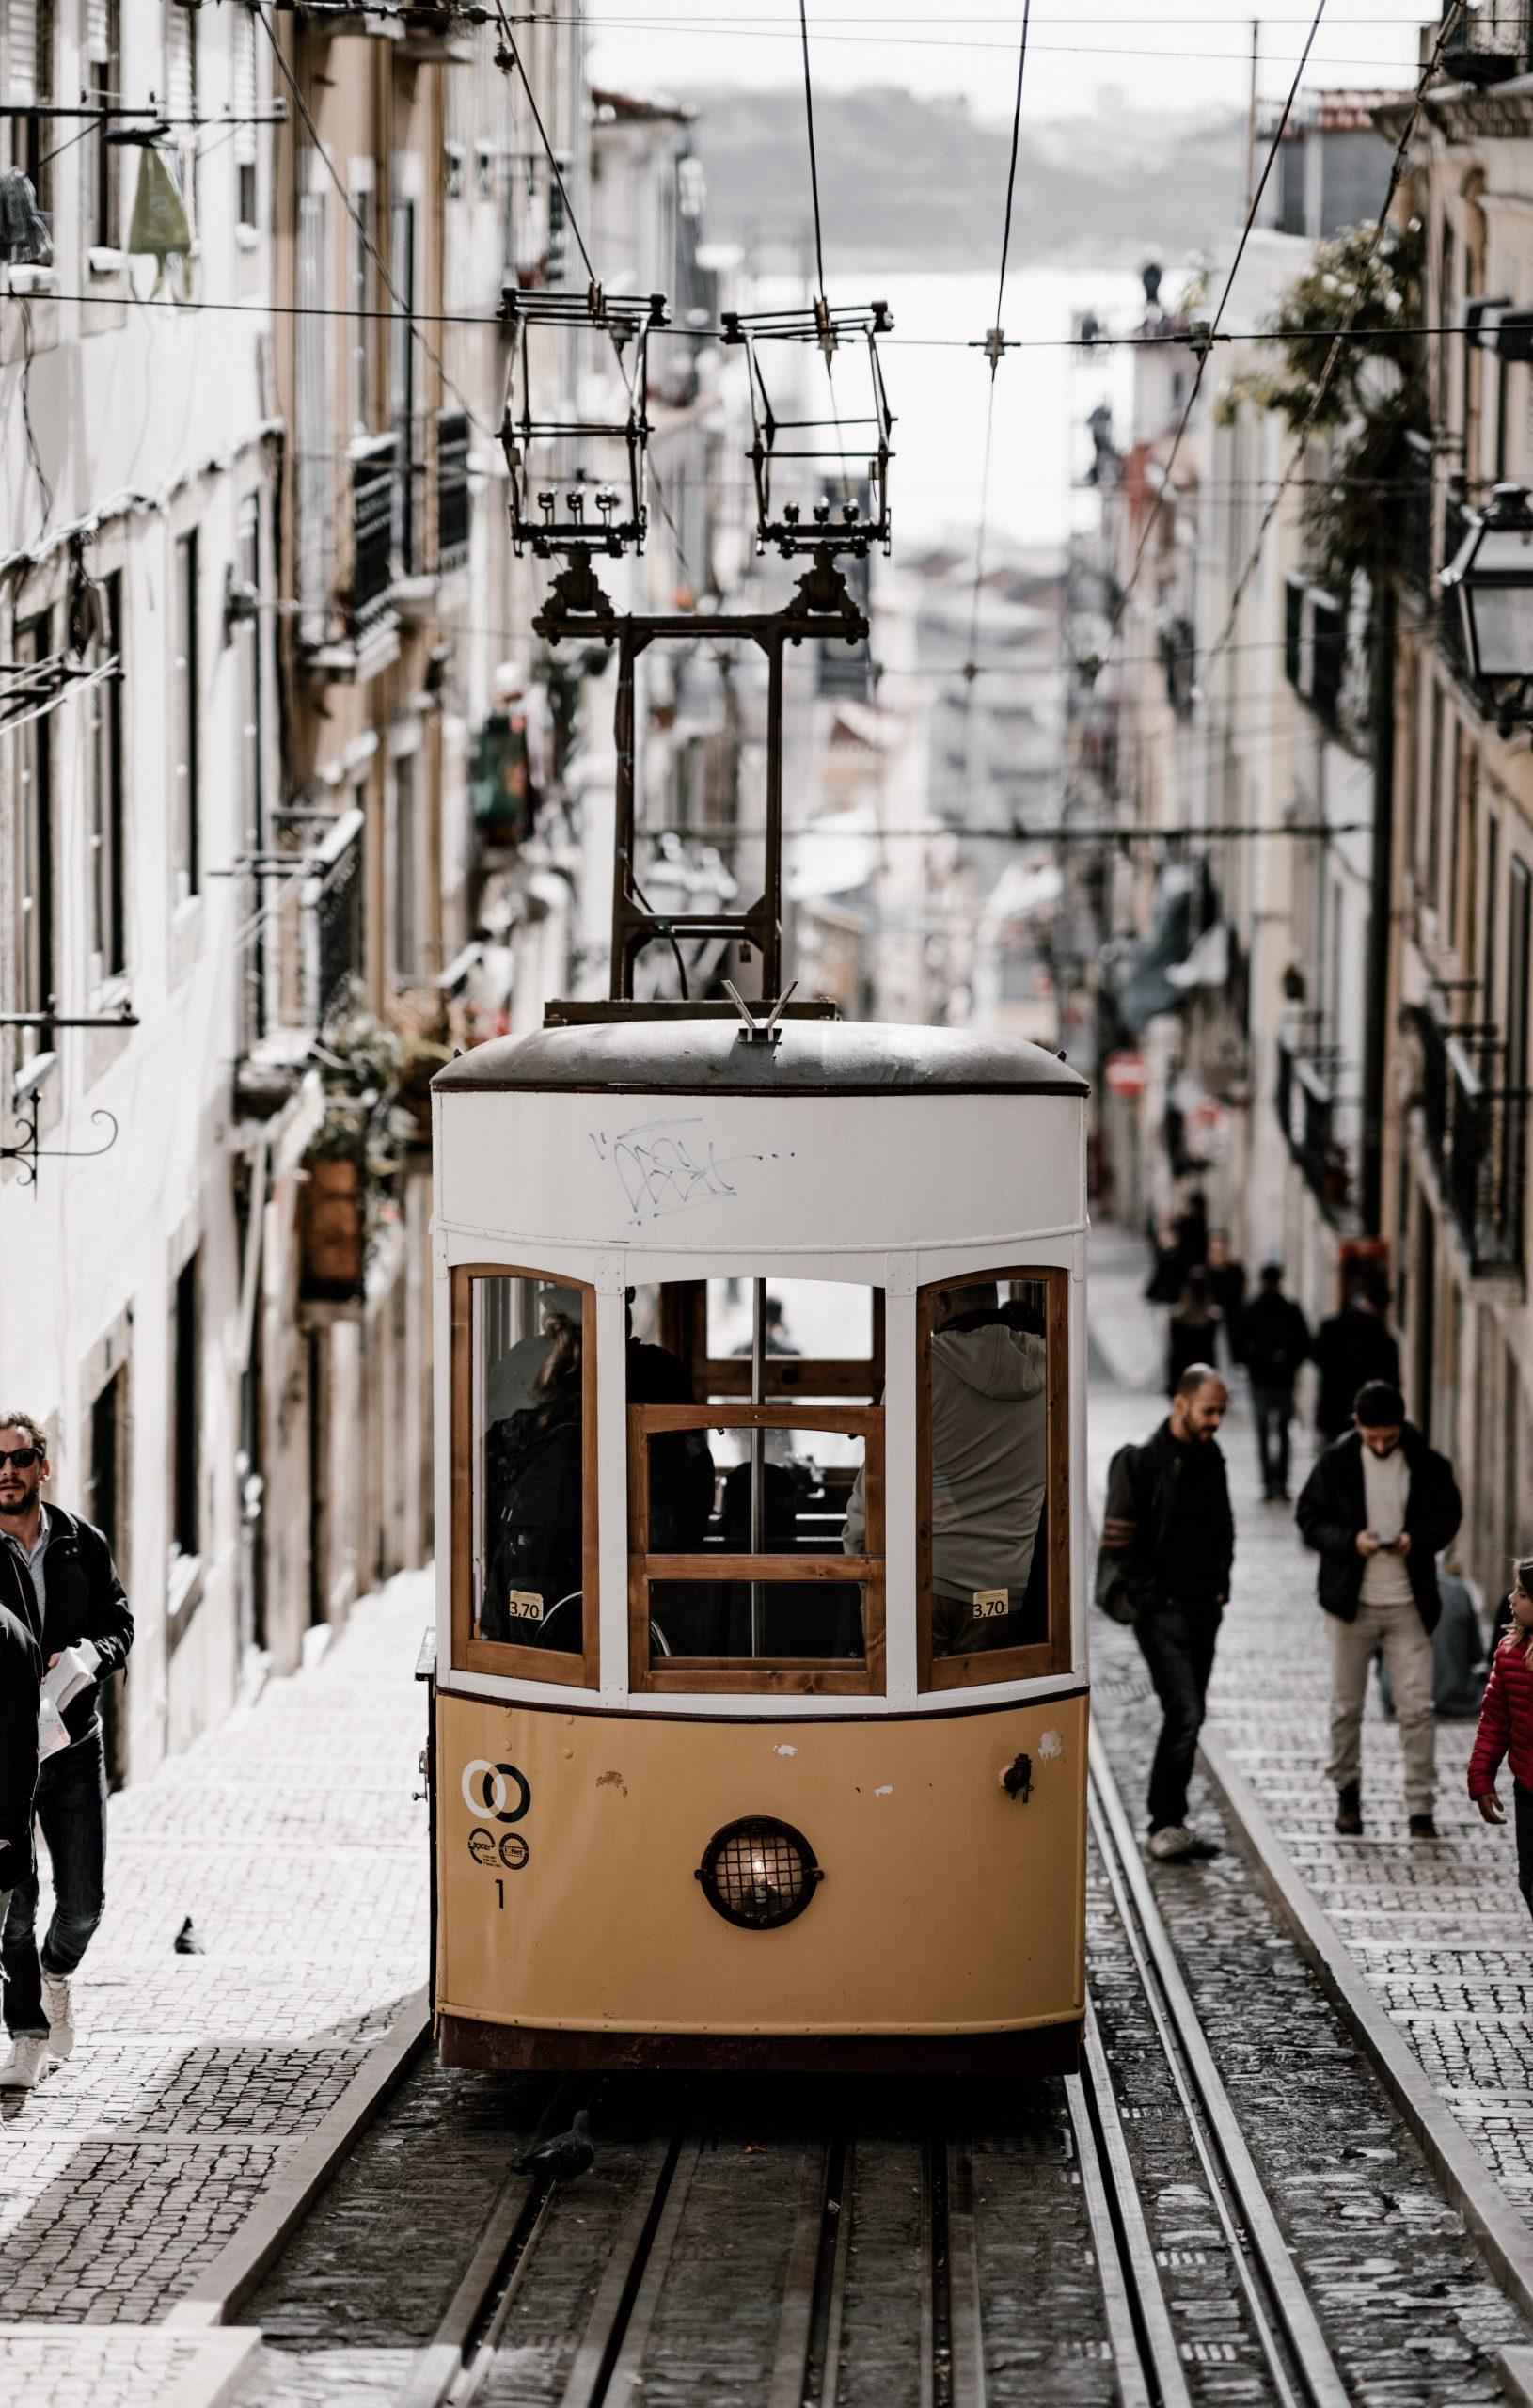 lisbon airport bus, lisbon airport metro, lisbon airport to city center, Lisbon airport to city, How To Get From Lisbon Airport To City Center